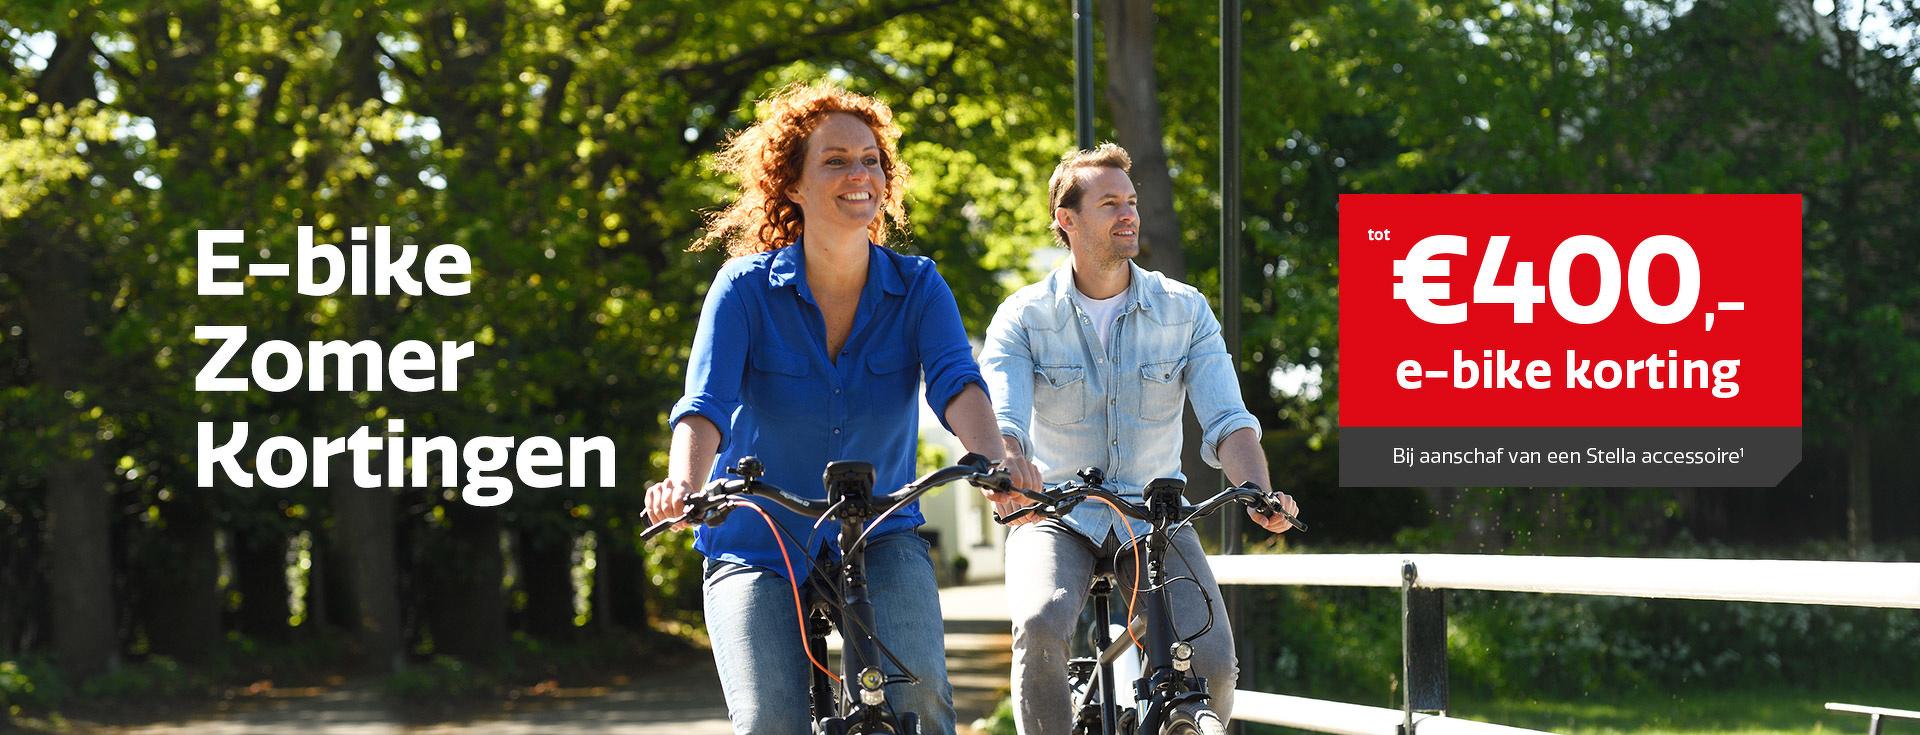 E-bike Zomer Kortingen